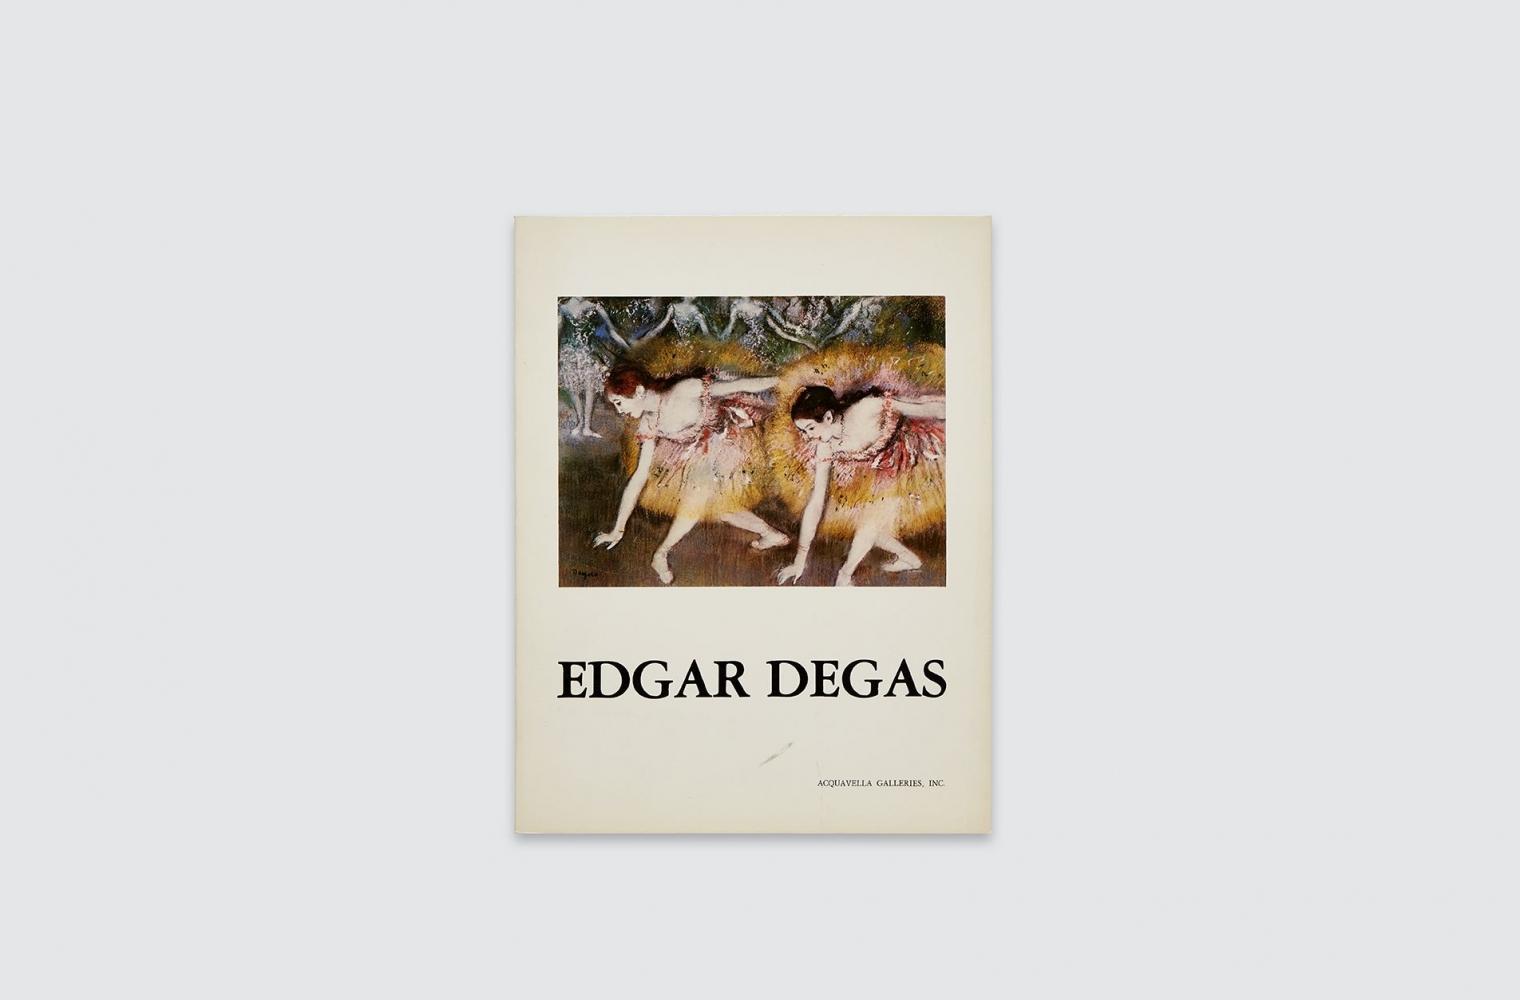 Catalogue for Degas